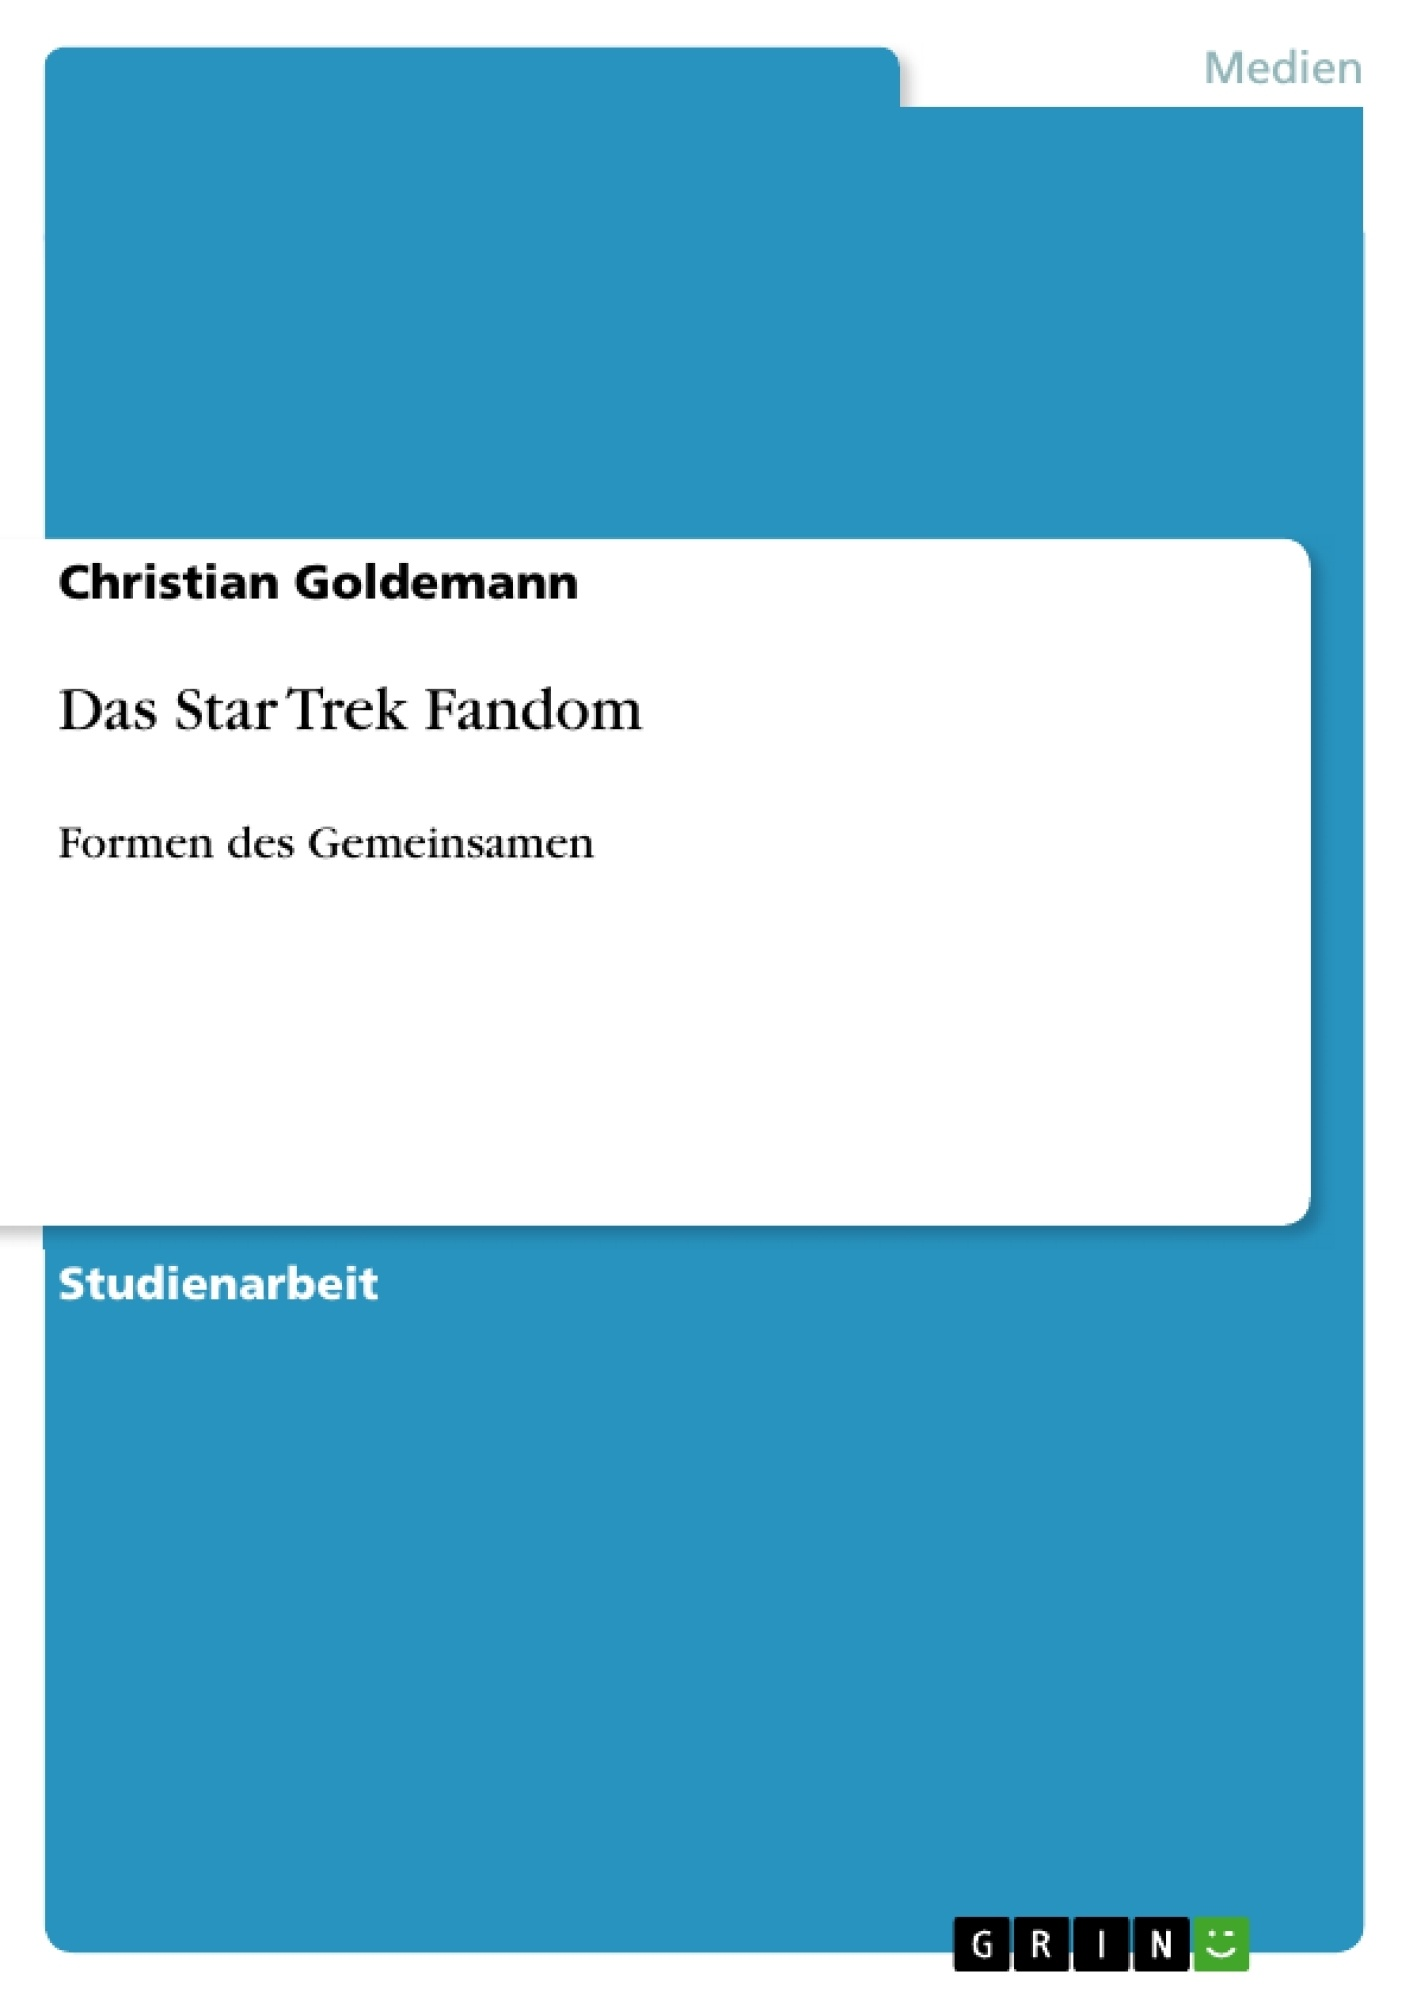 Titel: Das Star Trek Fandom